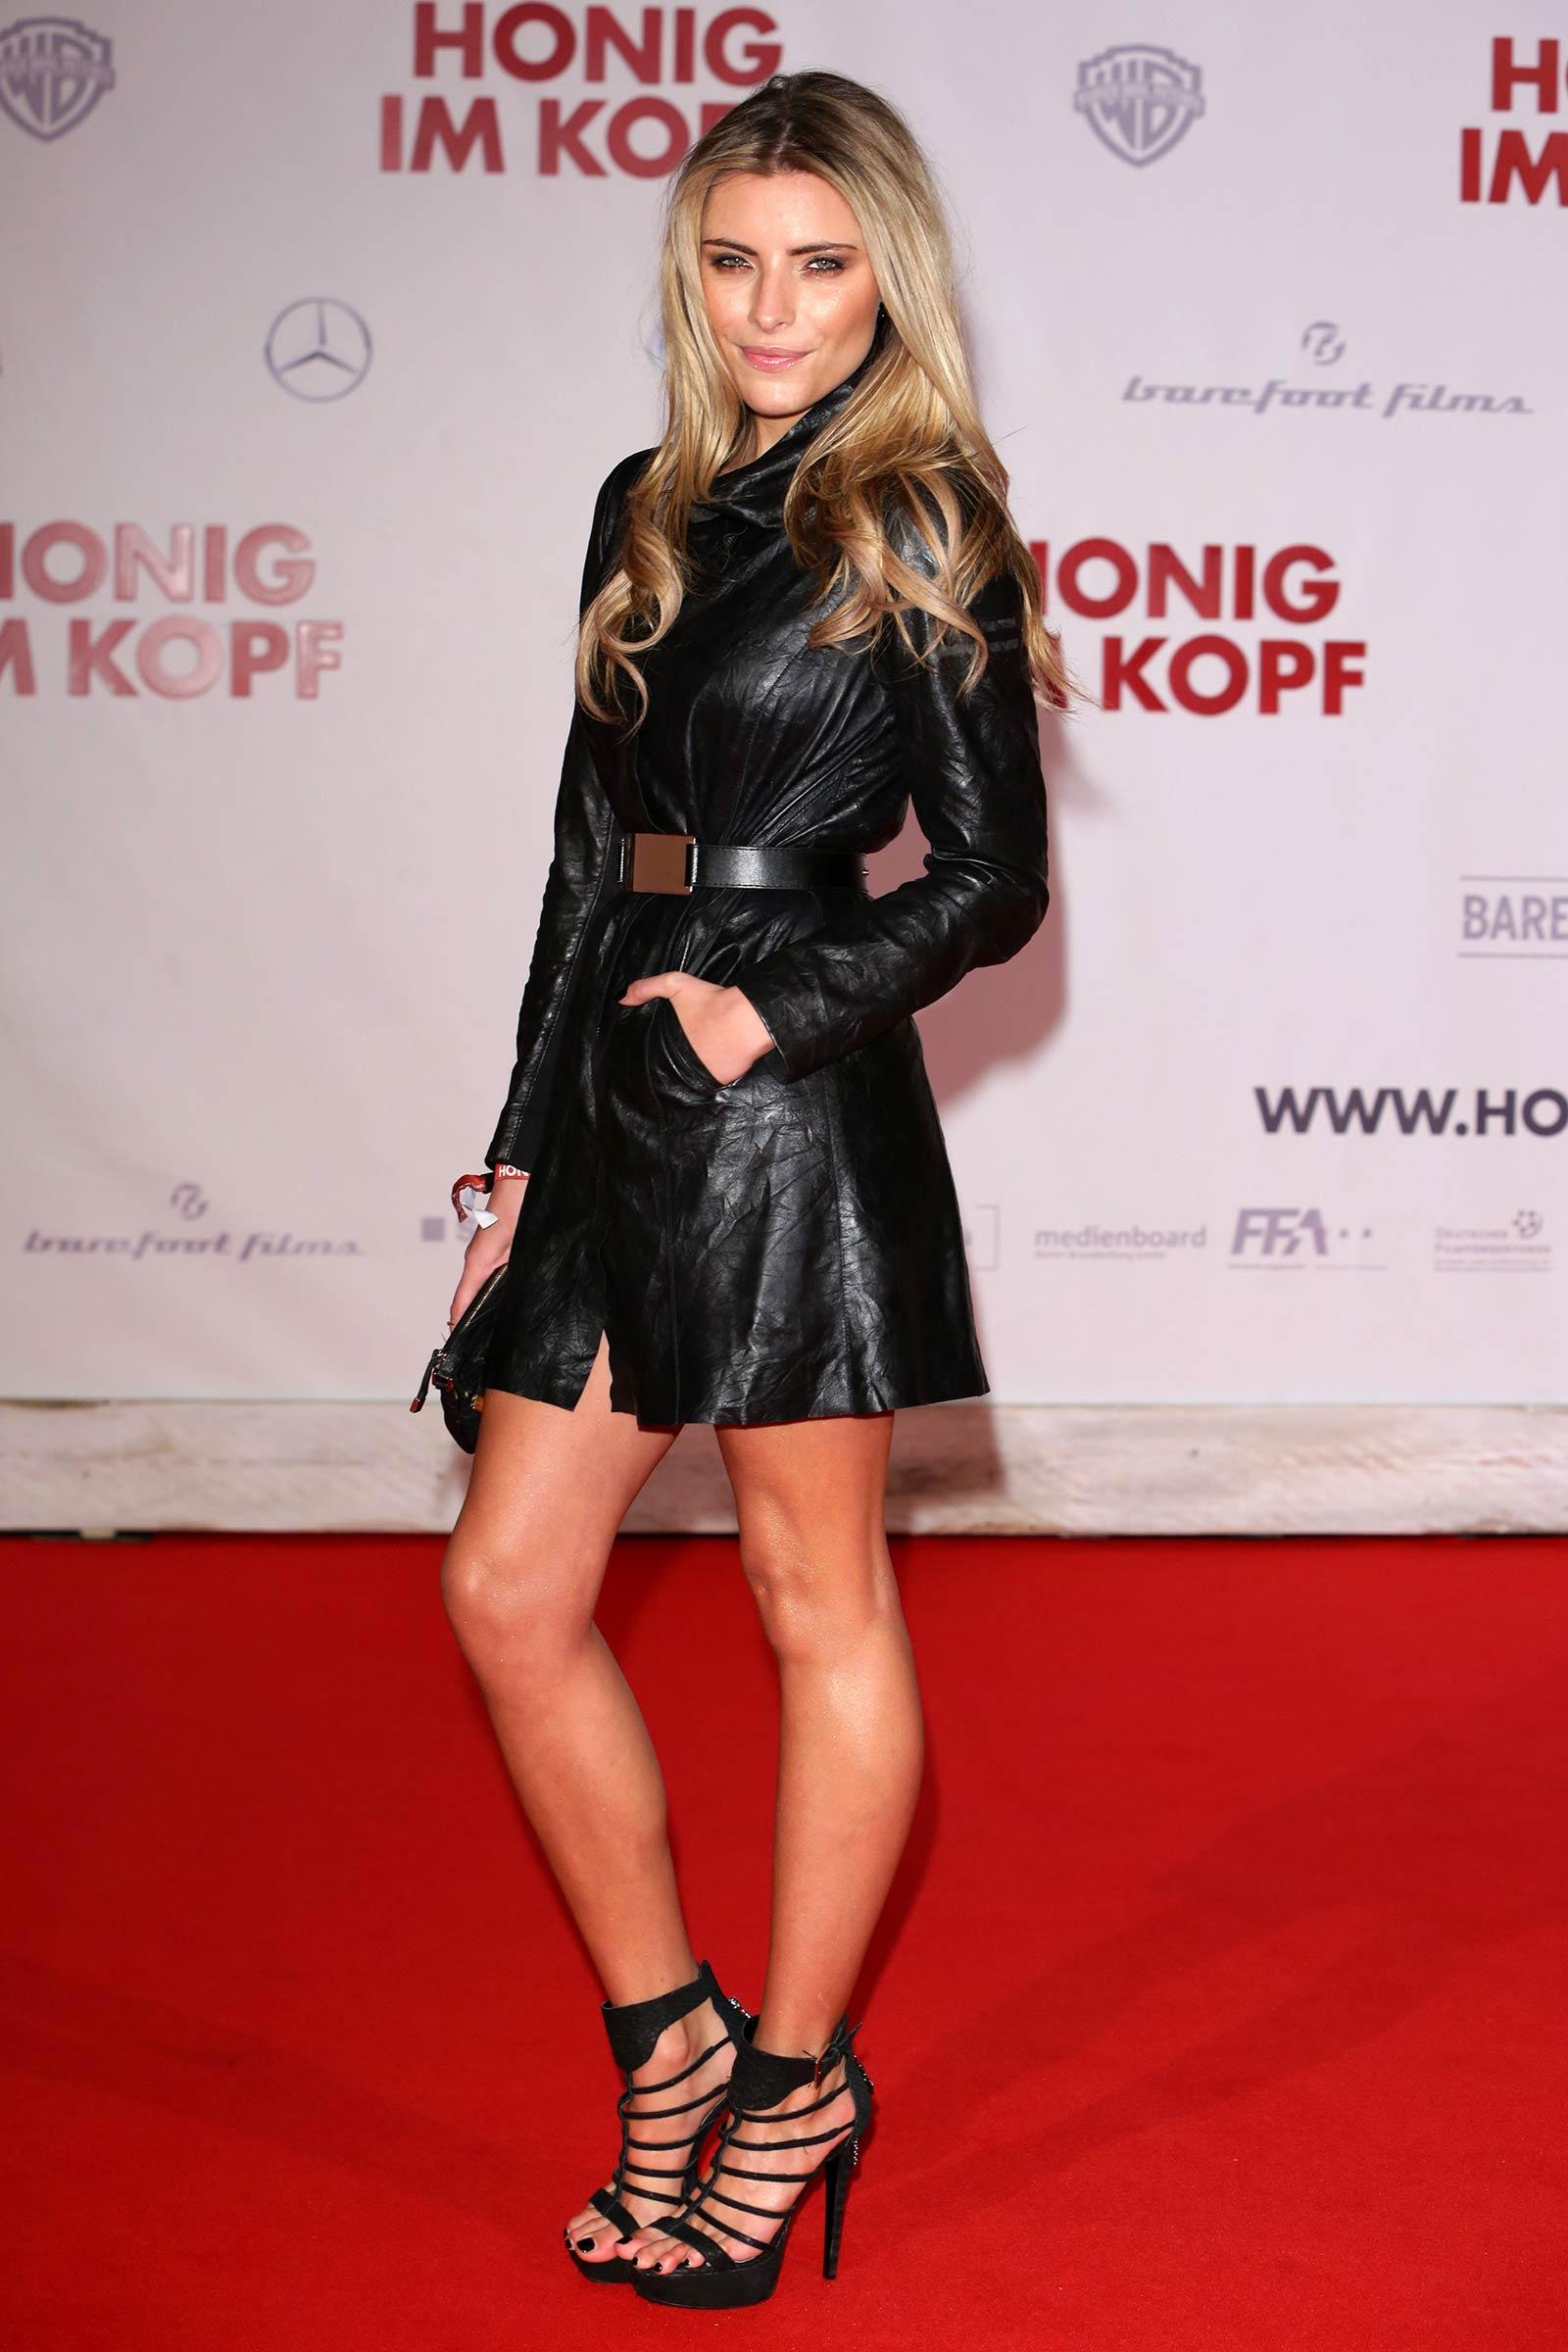 Sophia Thomalla attends Honig im Kopf premiere